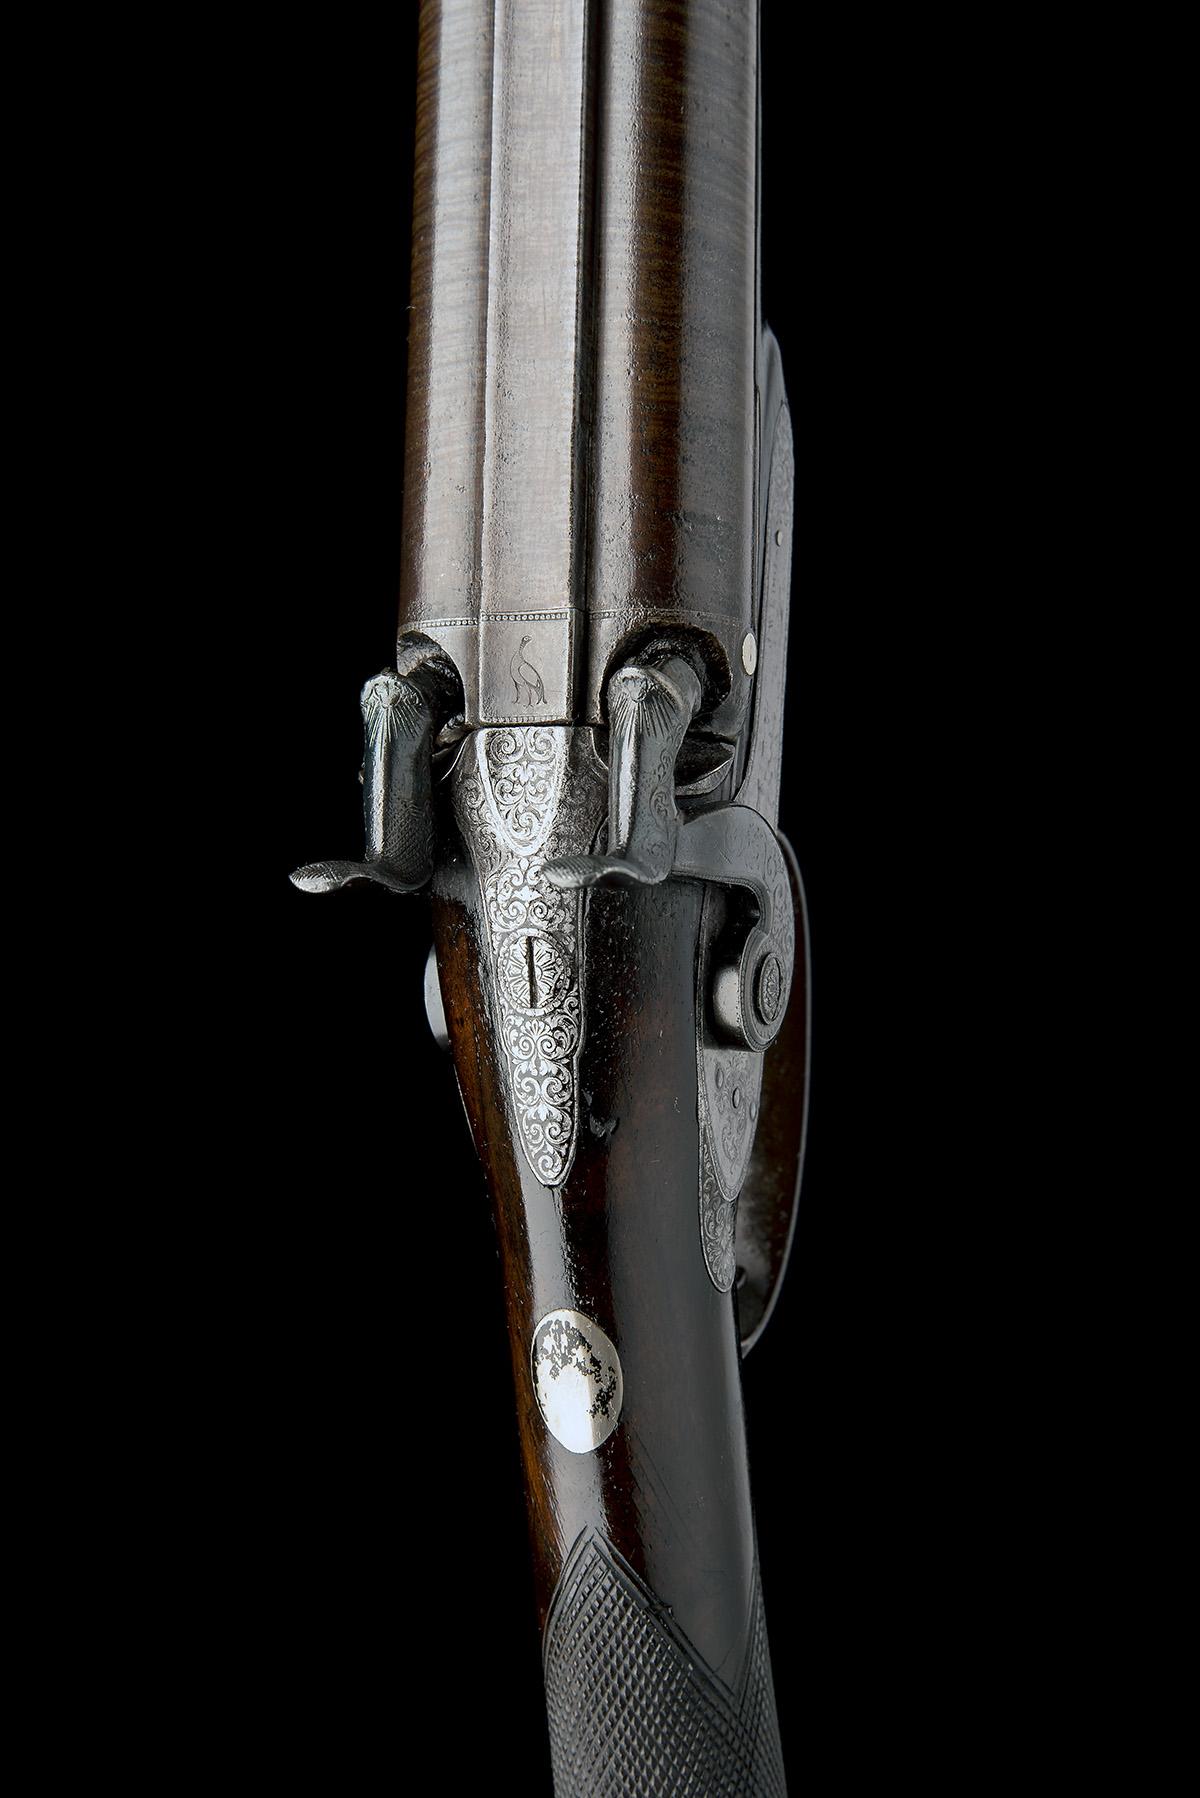 J.W. EDGE, MANCHESTER A 14-BORE PERCUSSION DOUBLE-BARRELLED SPORTING-GUN, serial no. 1350, circa - Image 4 of 8